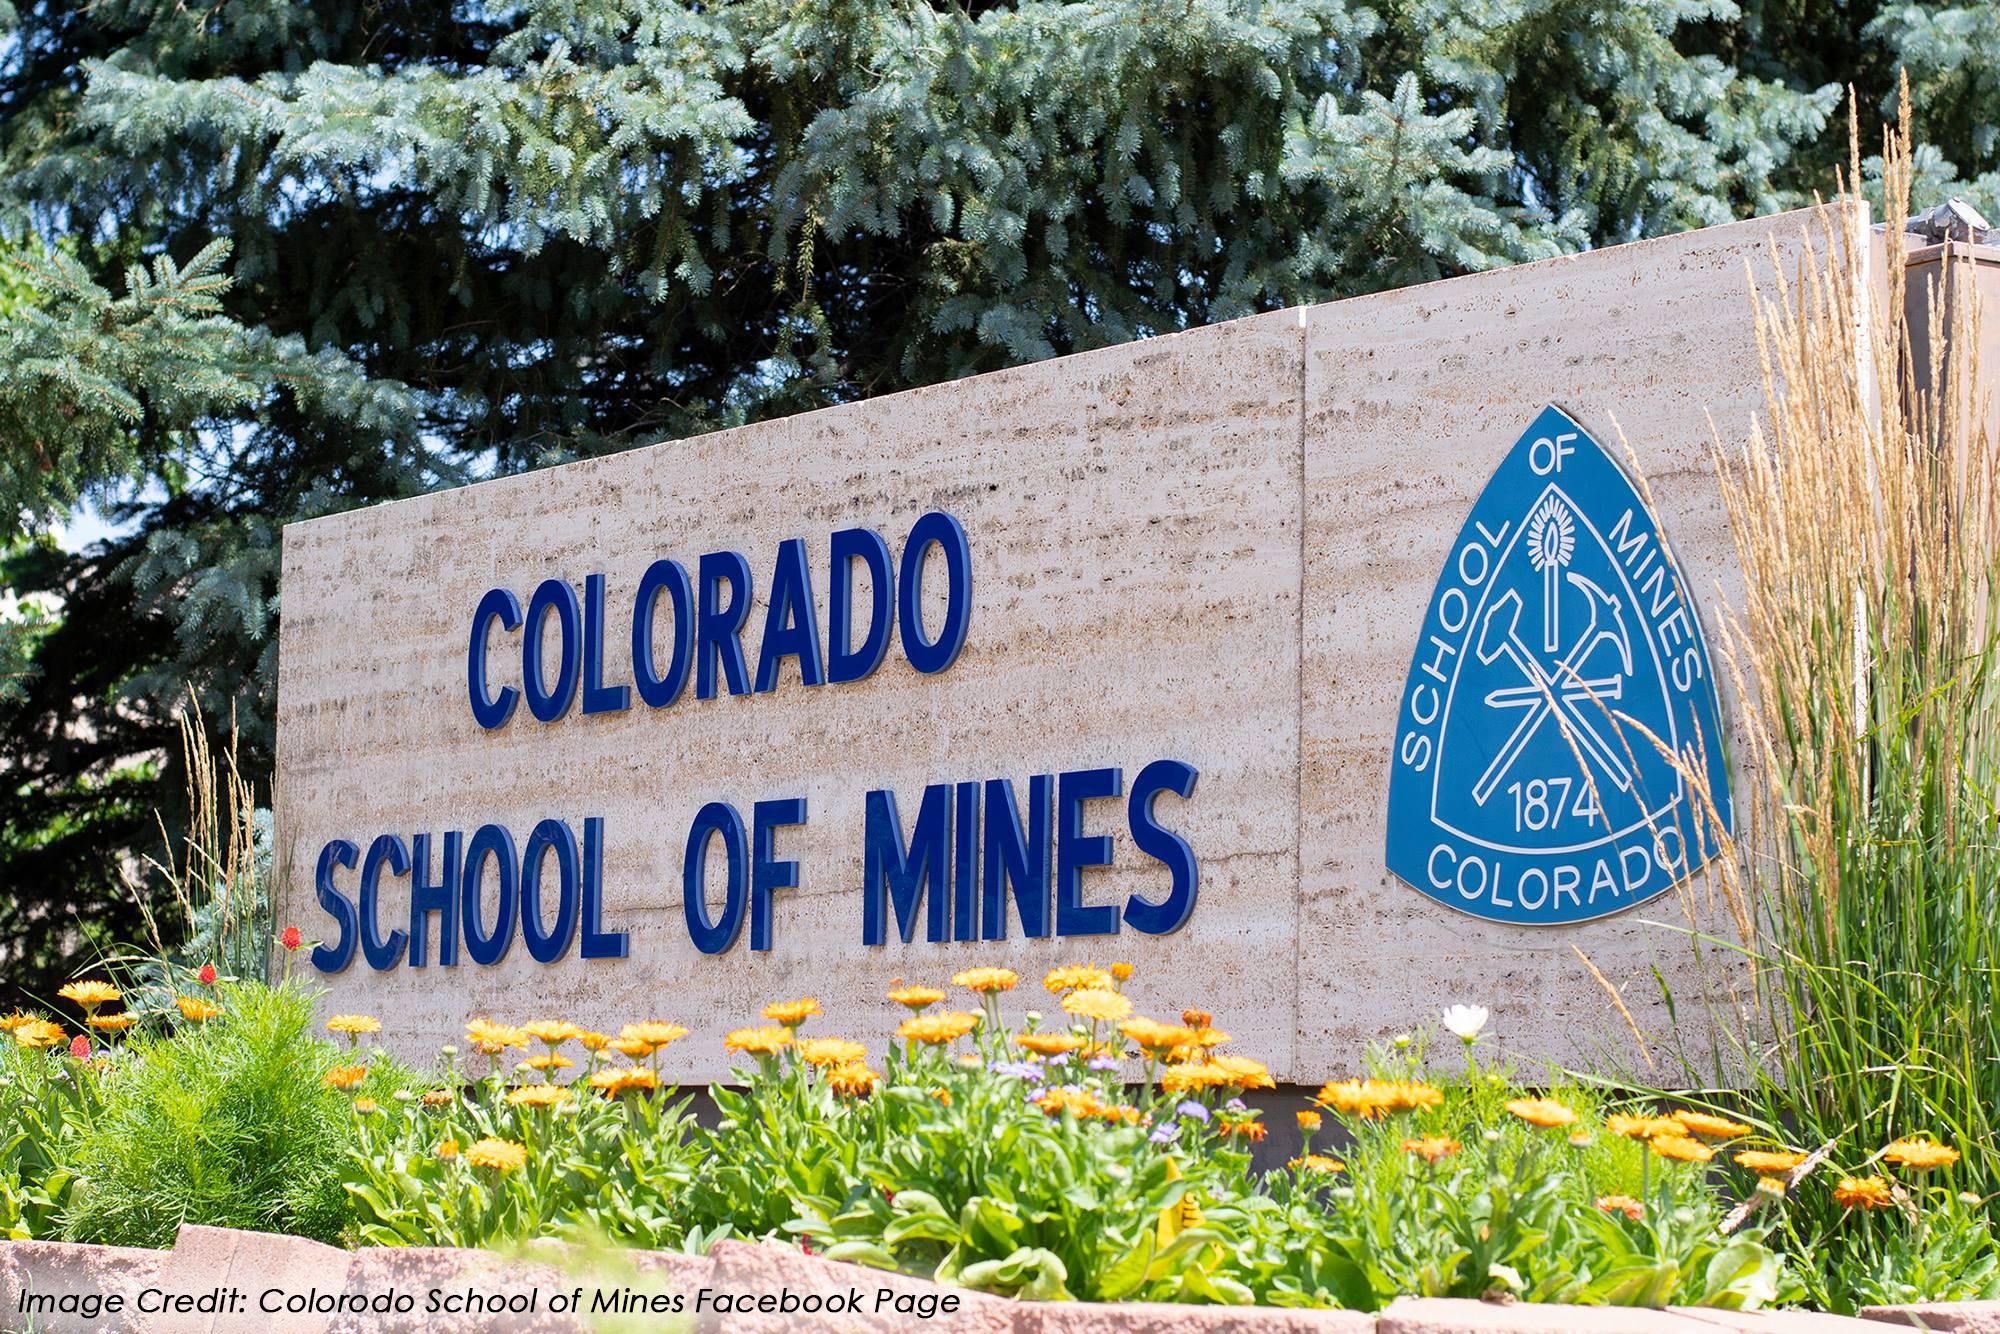 In Situ Ellipsometer Integration - Image Credit Colorado School Of Mines Facebook Page